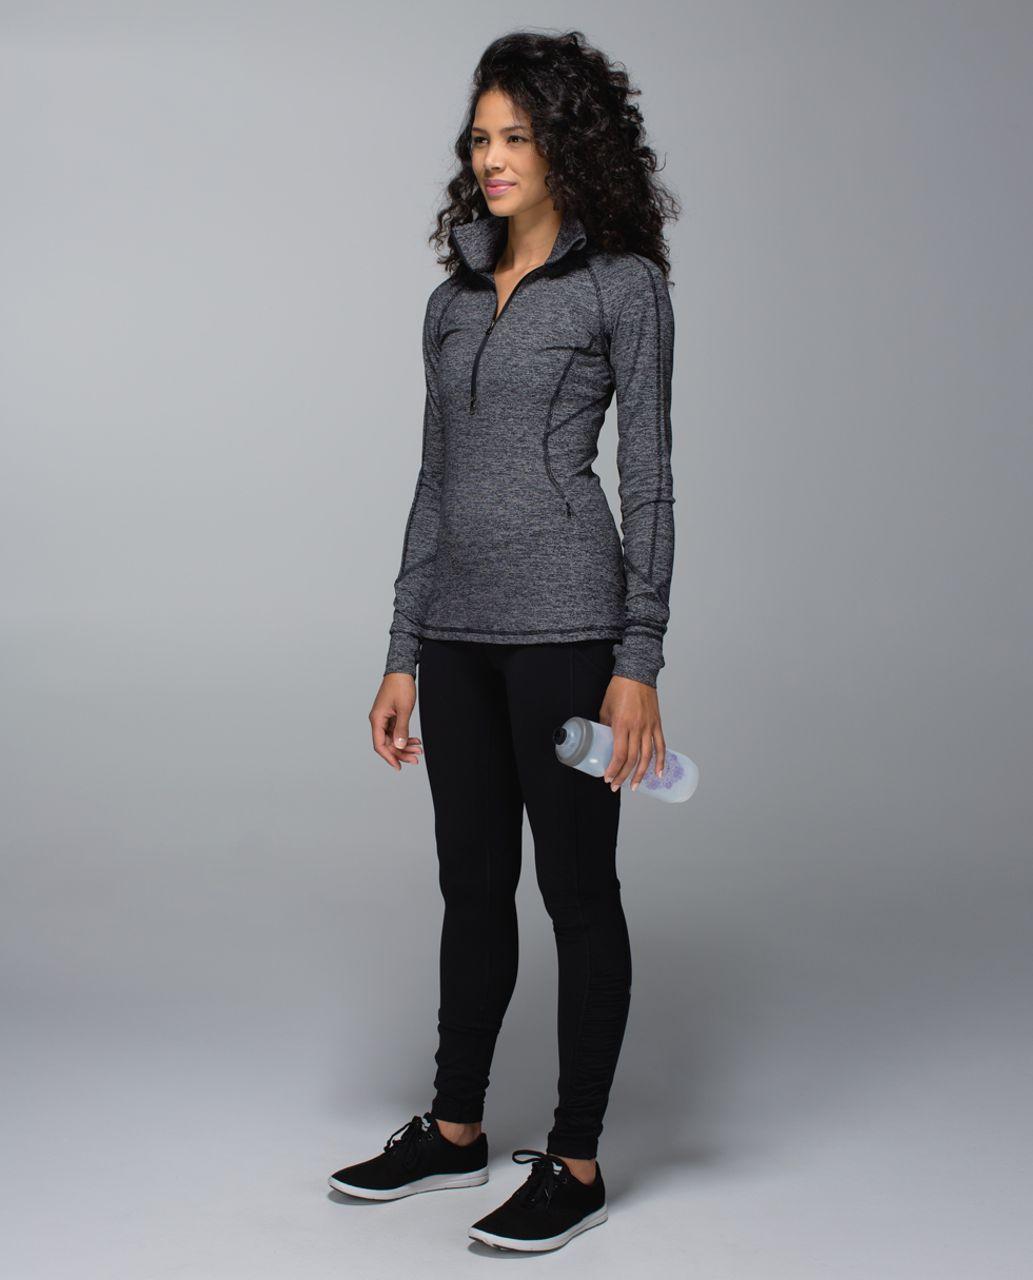 Lululemon Race Your Pace 1/2 Zip - Wee Stripe Black Heathered Black